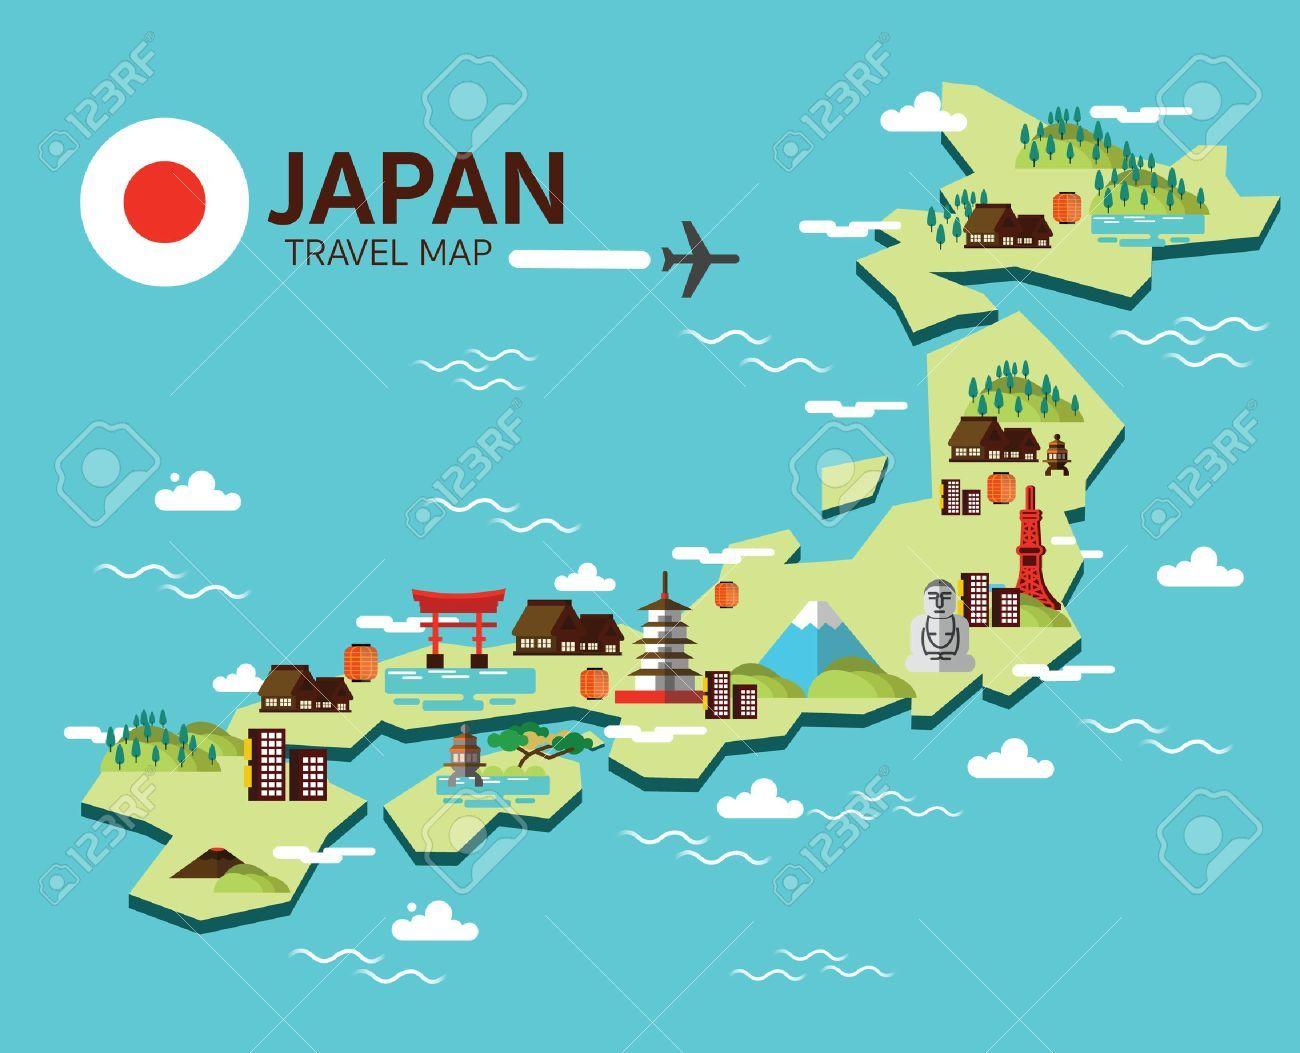 Stock Vector in 2019 | Map | Travel maps, Japan illustration, Japan ...